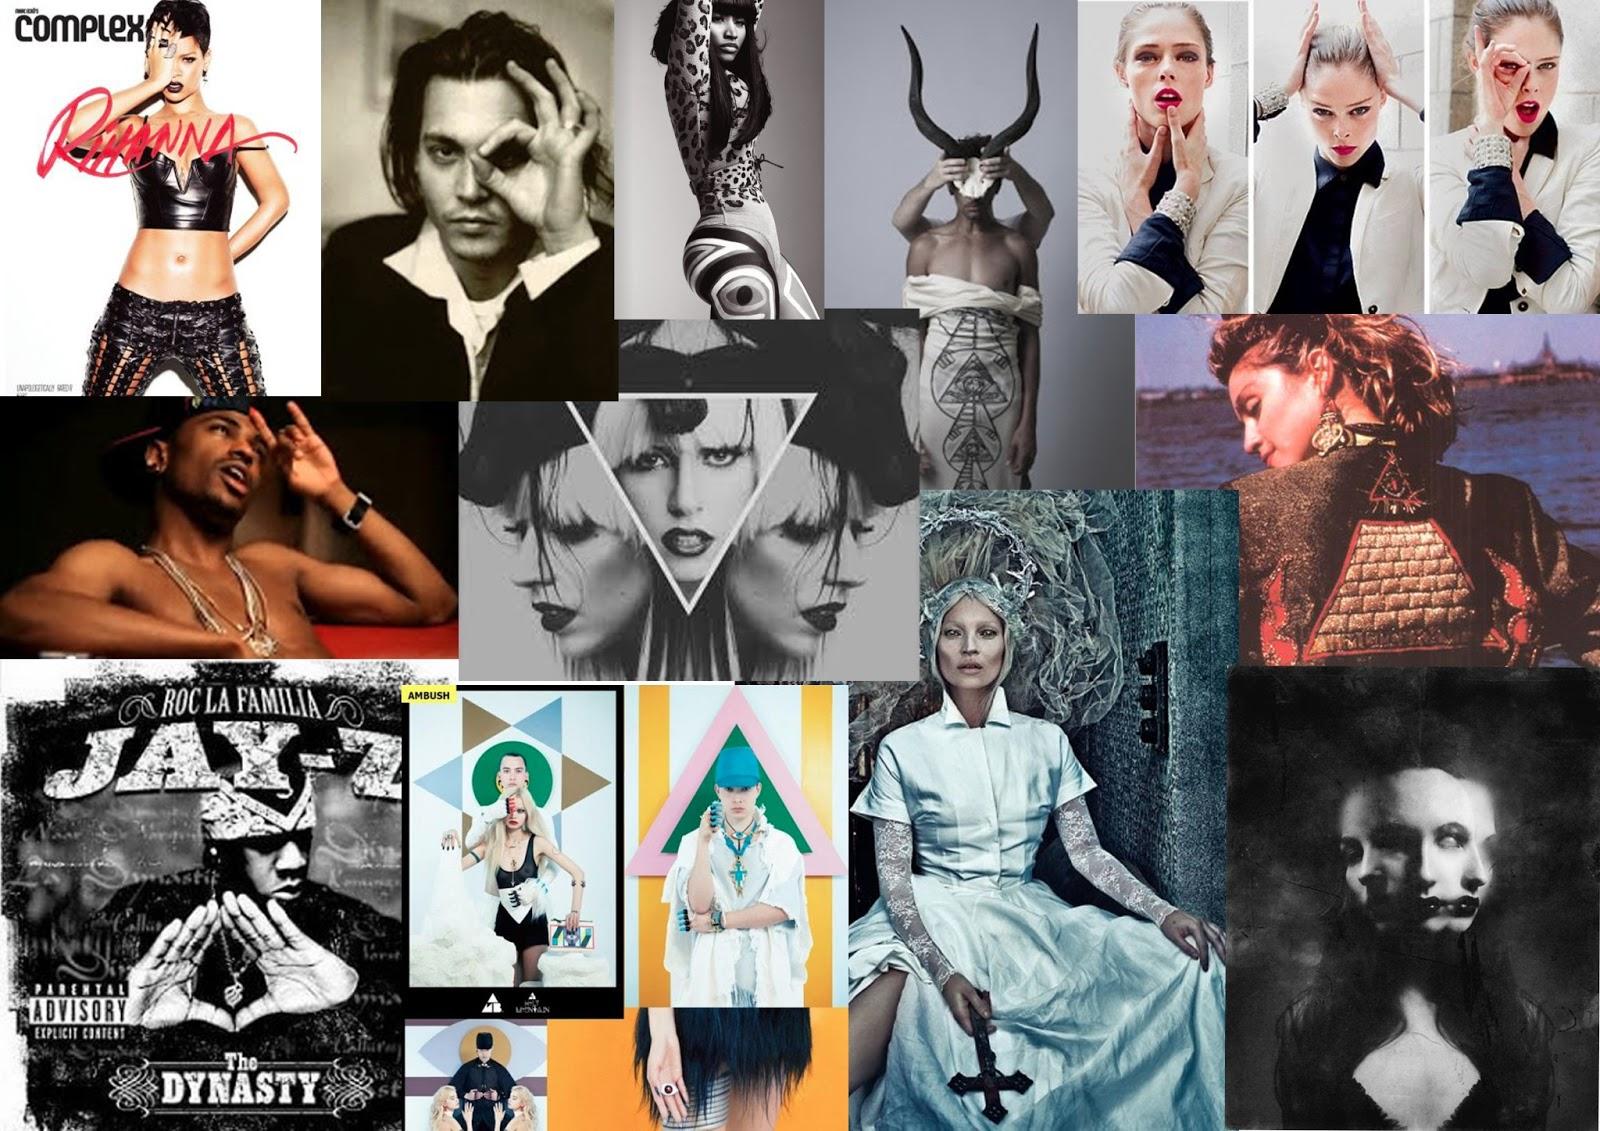 Illuminati symbolic shoot magazine project poses will include biocorpaavc Choice Image